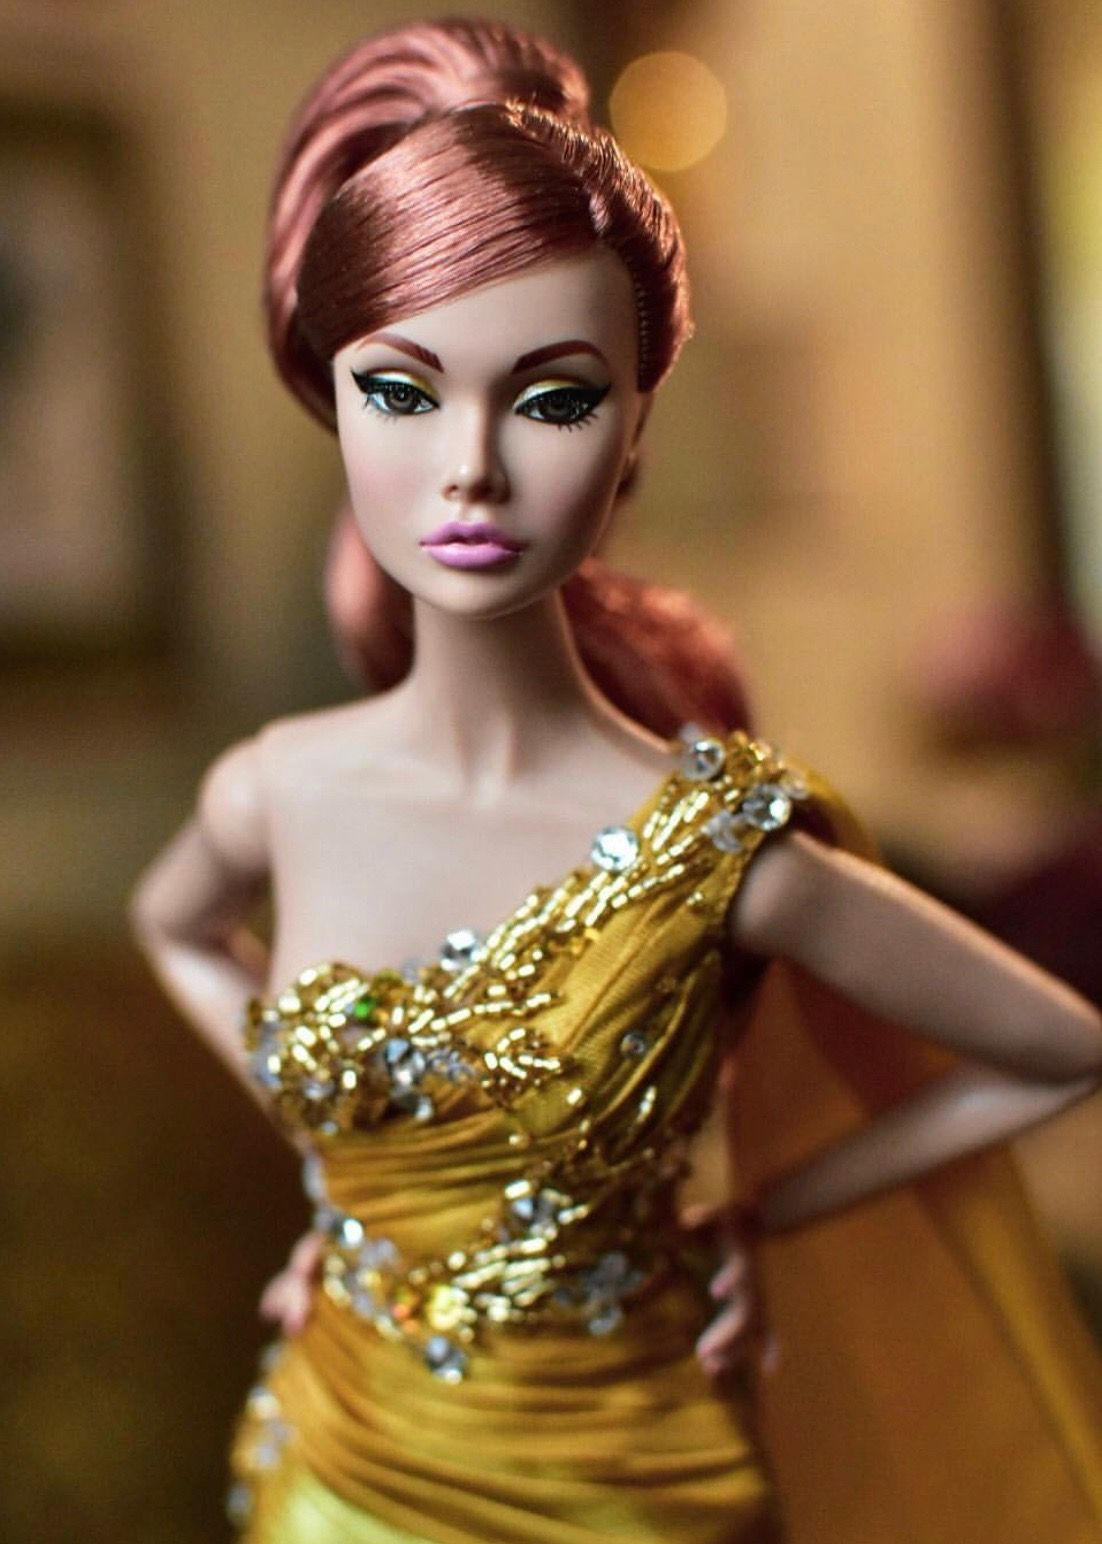 38534 jacobdolls barbie model poppy parker dolls